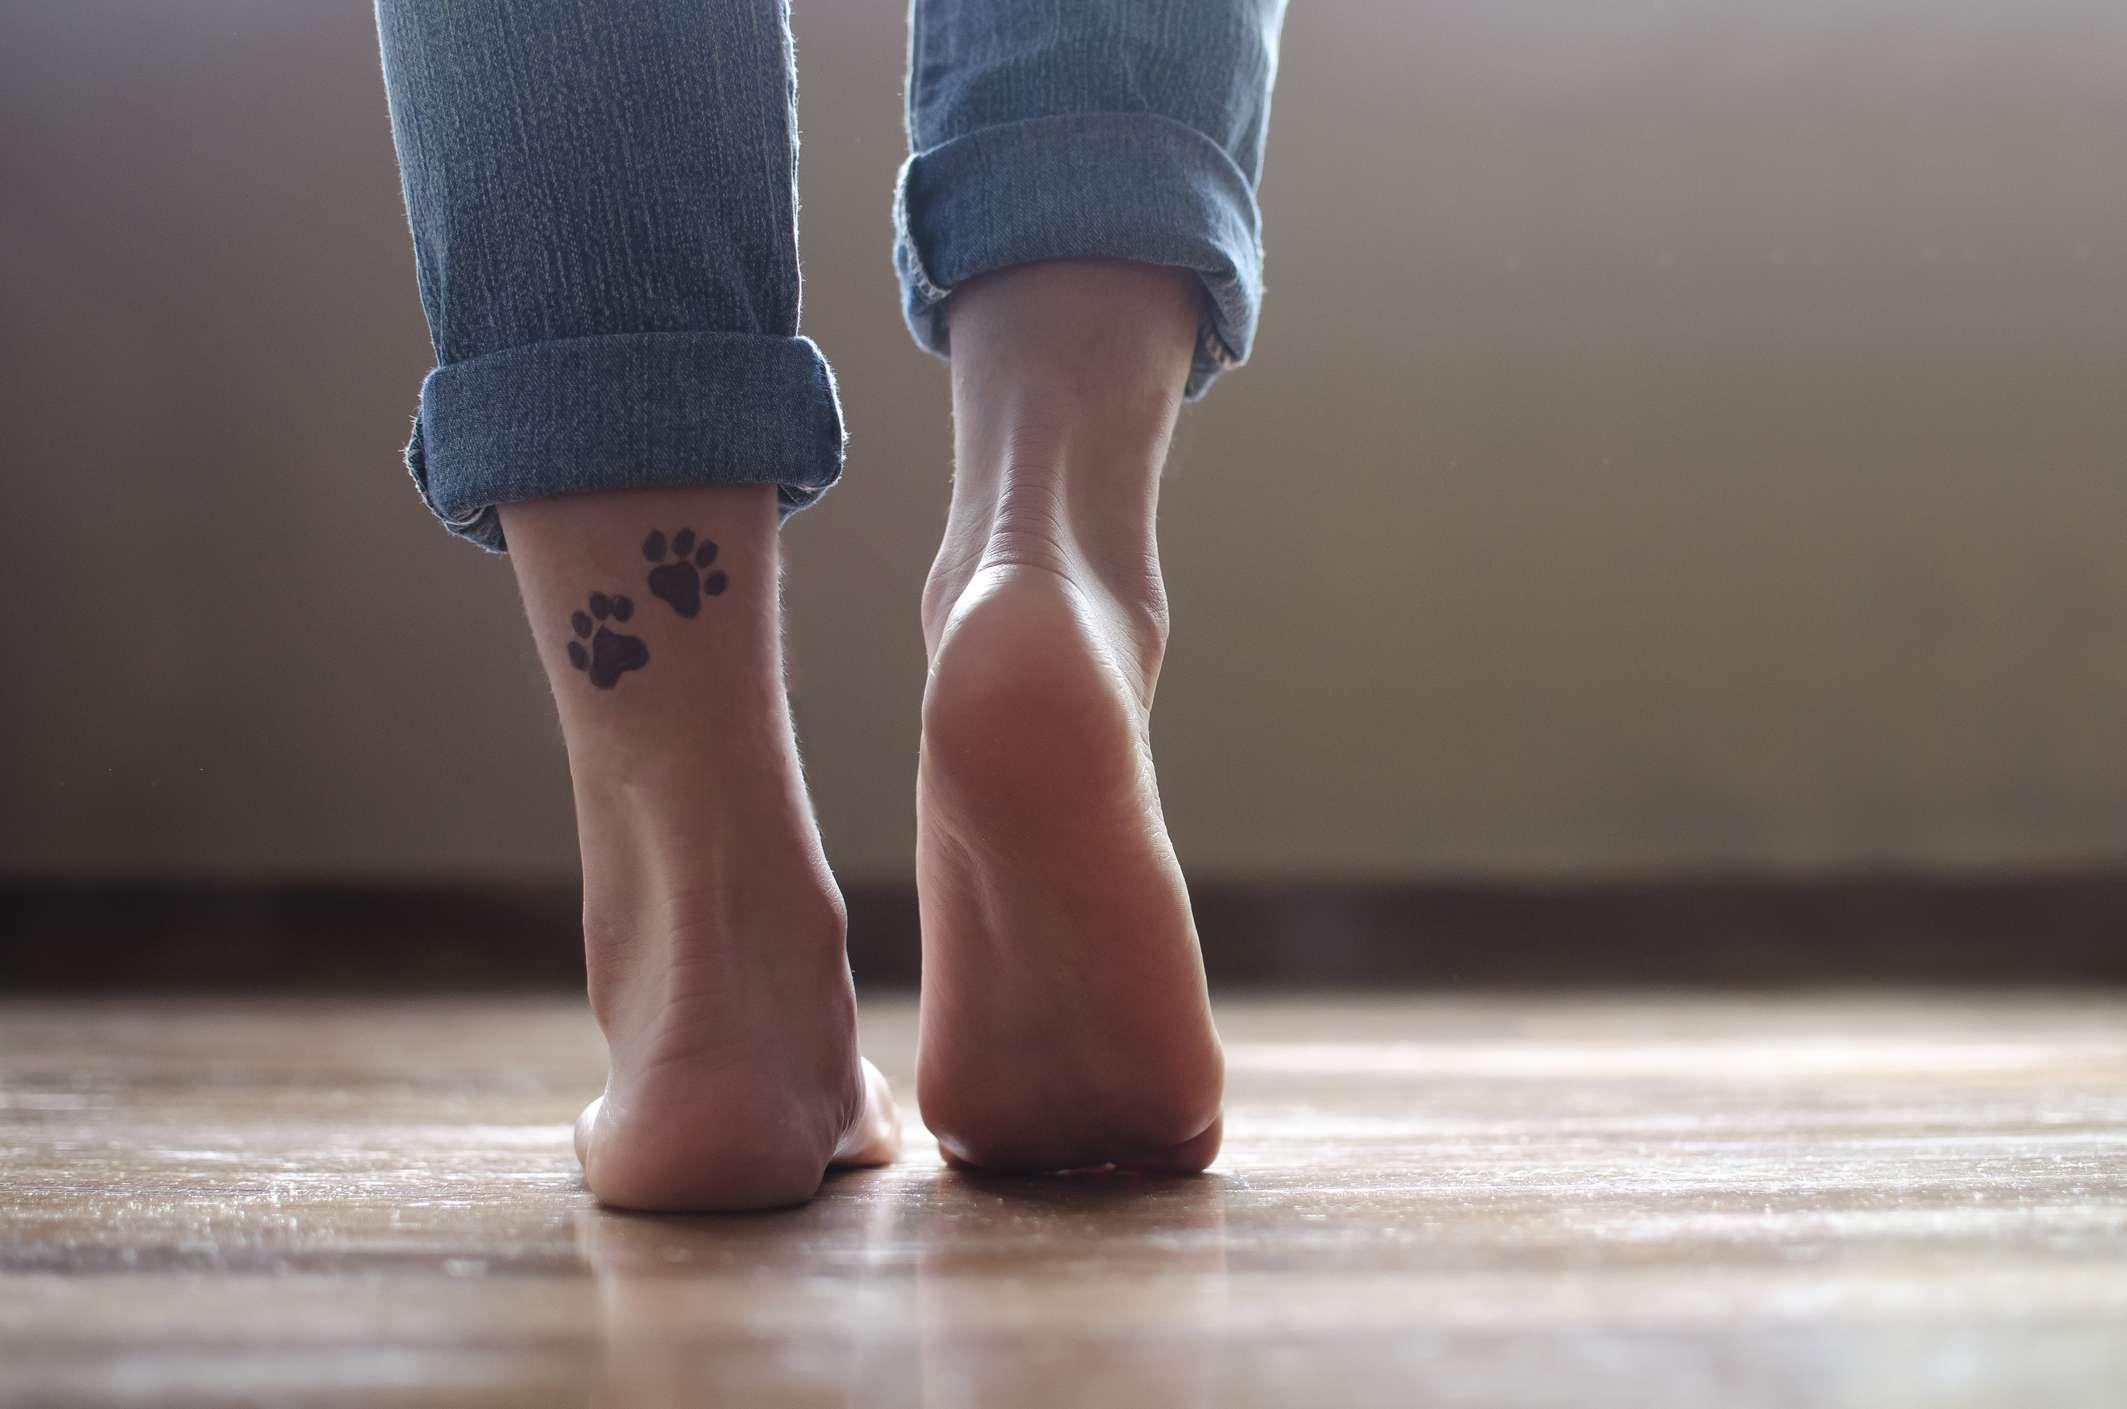 Leg with paw print tattoo